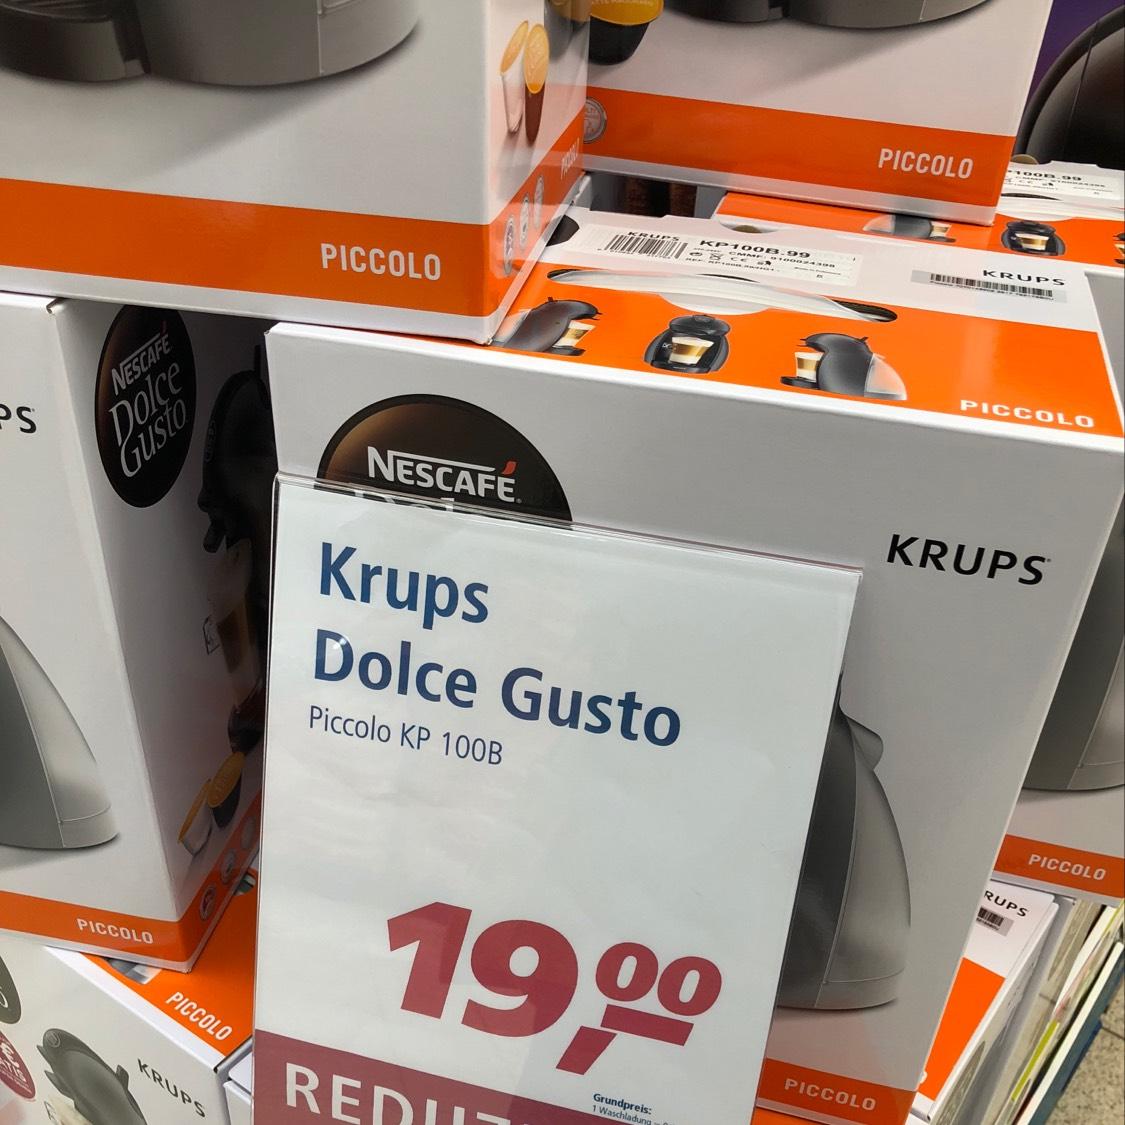 Real Neubrandenburg Krups Dolce Gusto Piccolo KP 100B + 10€ Guthaben